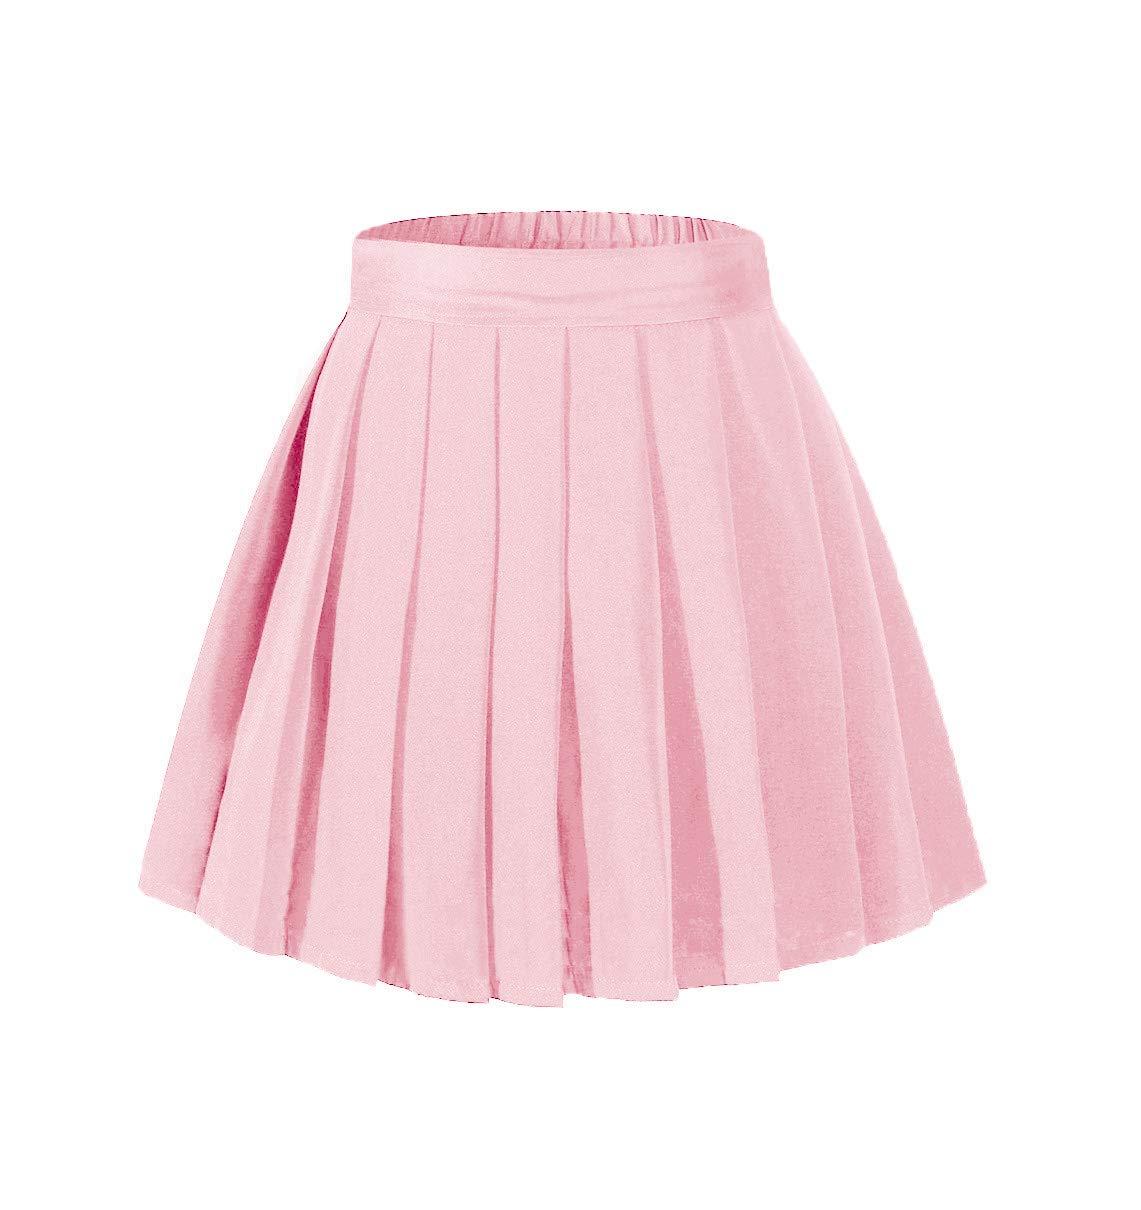 Women's A Line Mini Street Skirt Skater Pleated Full Skirts Pink,XL by Beautifulfashionlife